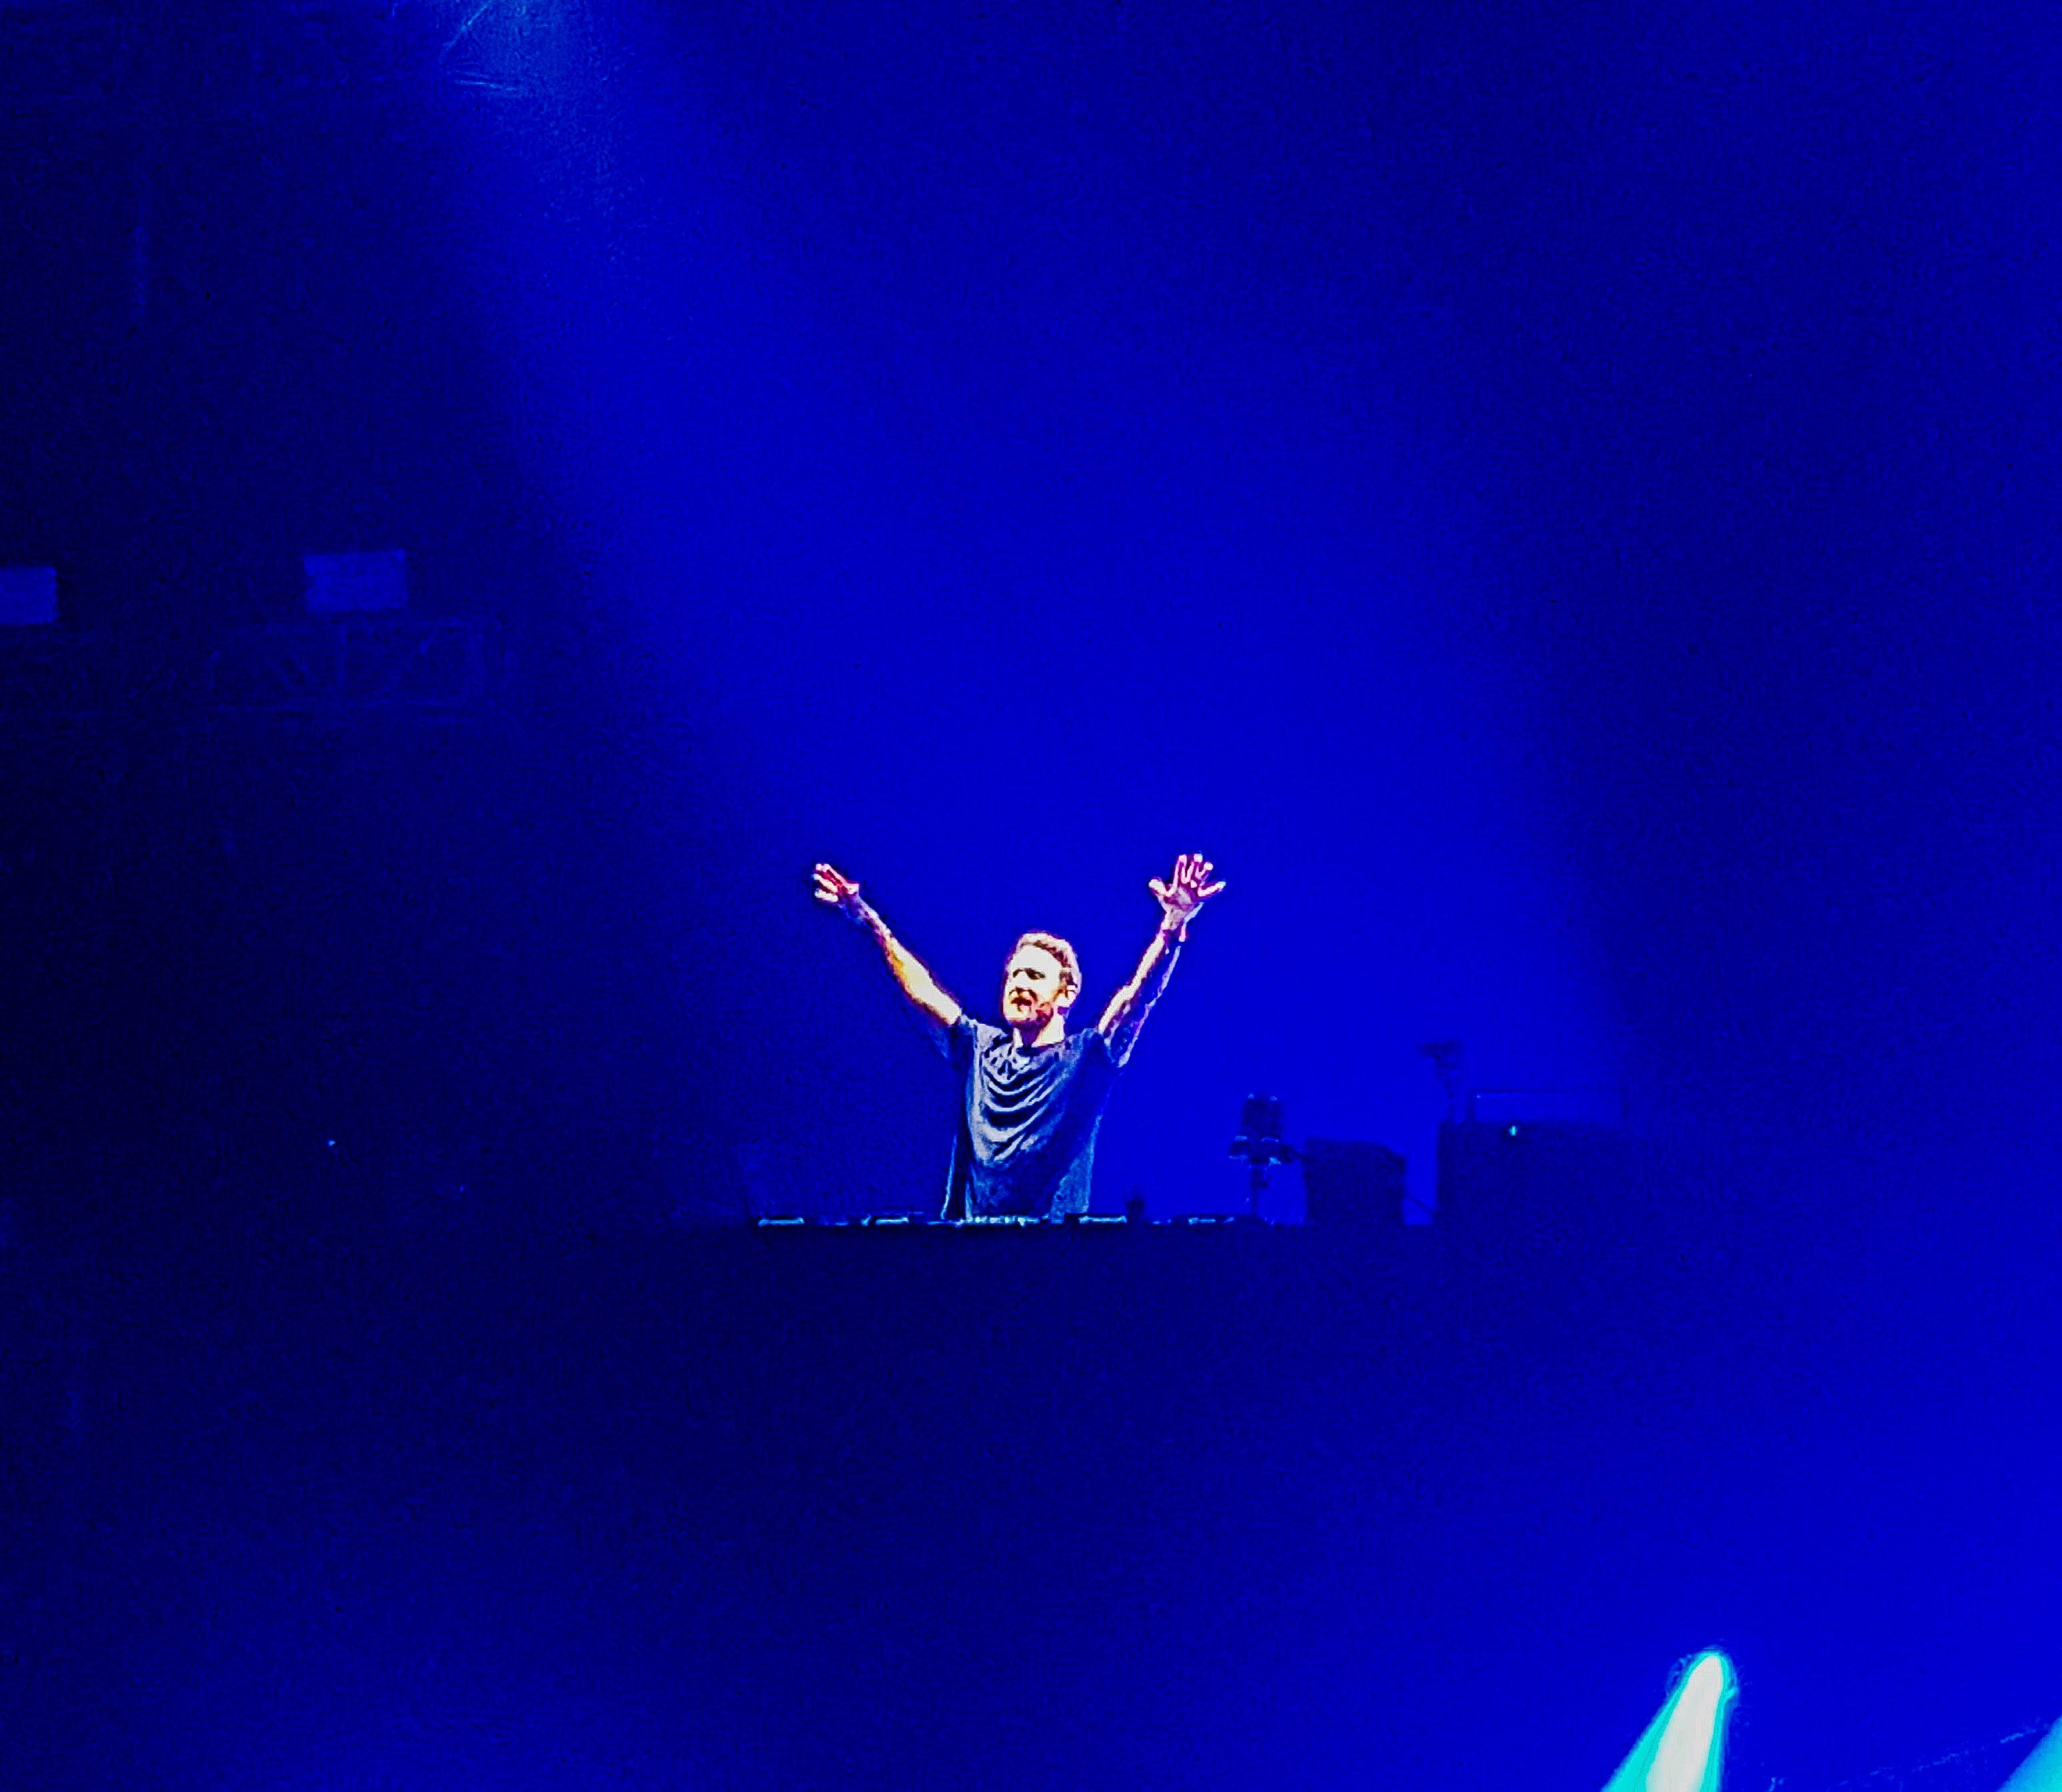 David Guetta Concert Experience